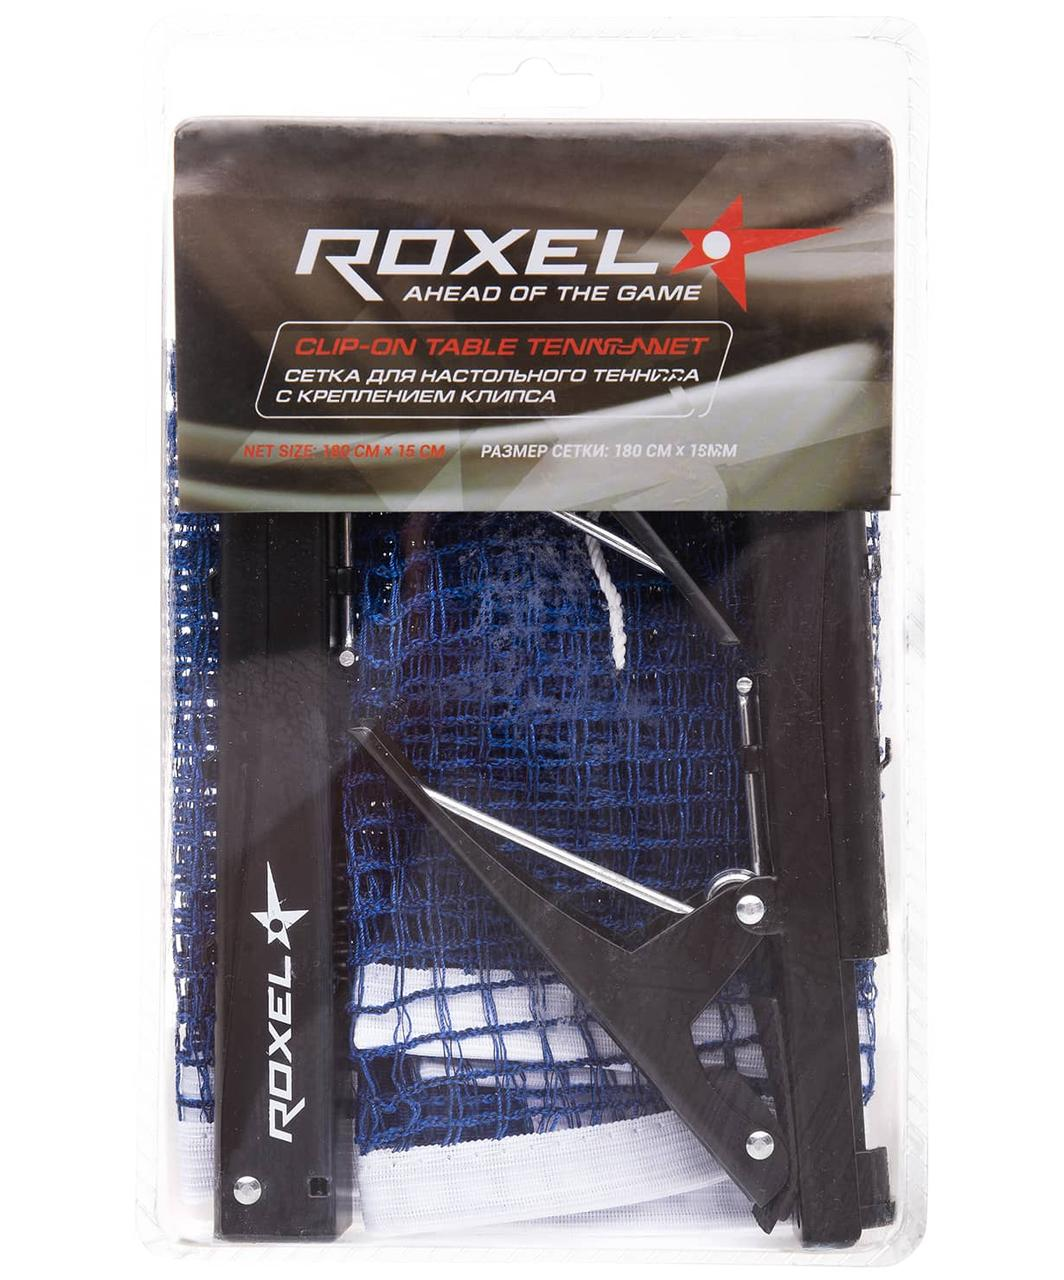 Сетка для настольного тенниса Clip-on, на клипсе Roxel